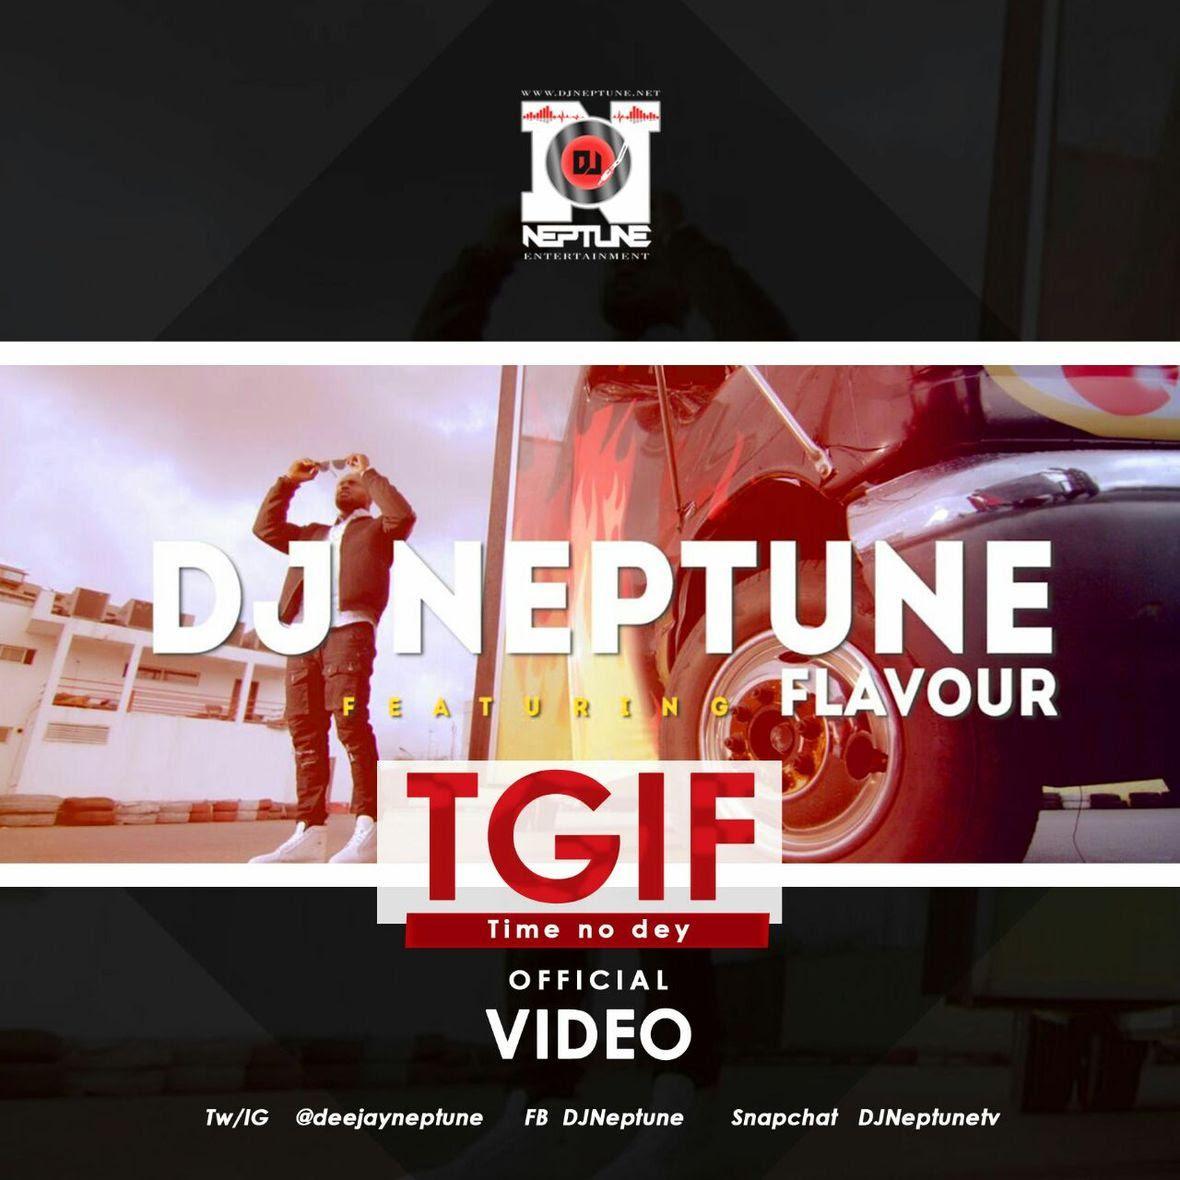 TGIF VIDEO IMAGE